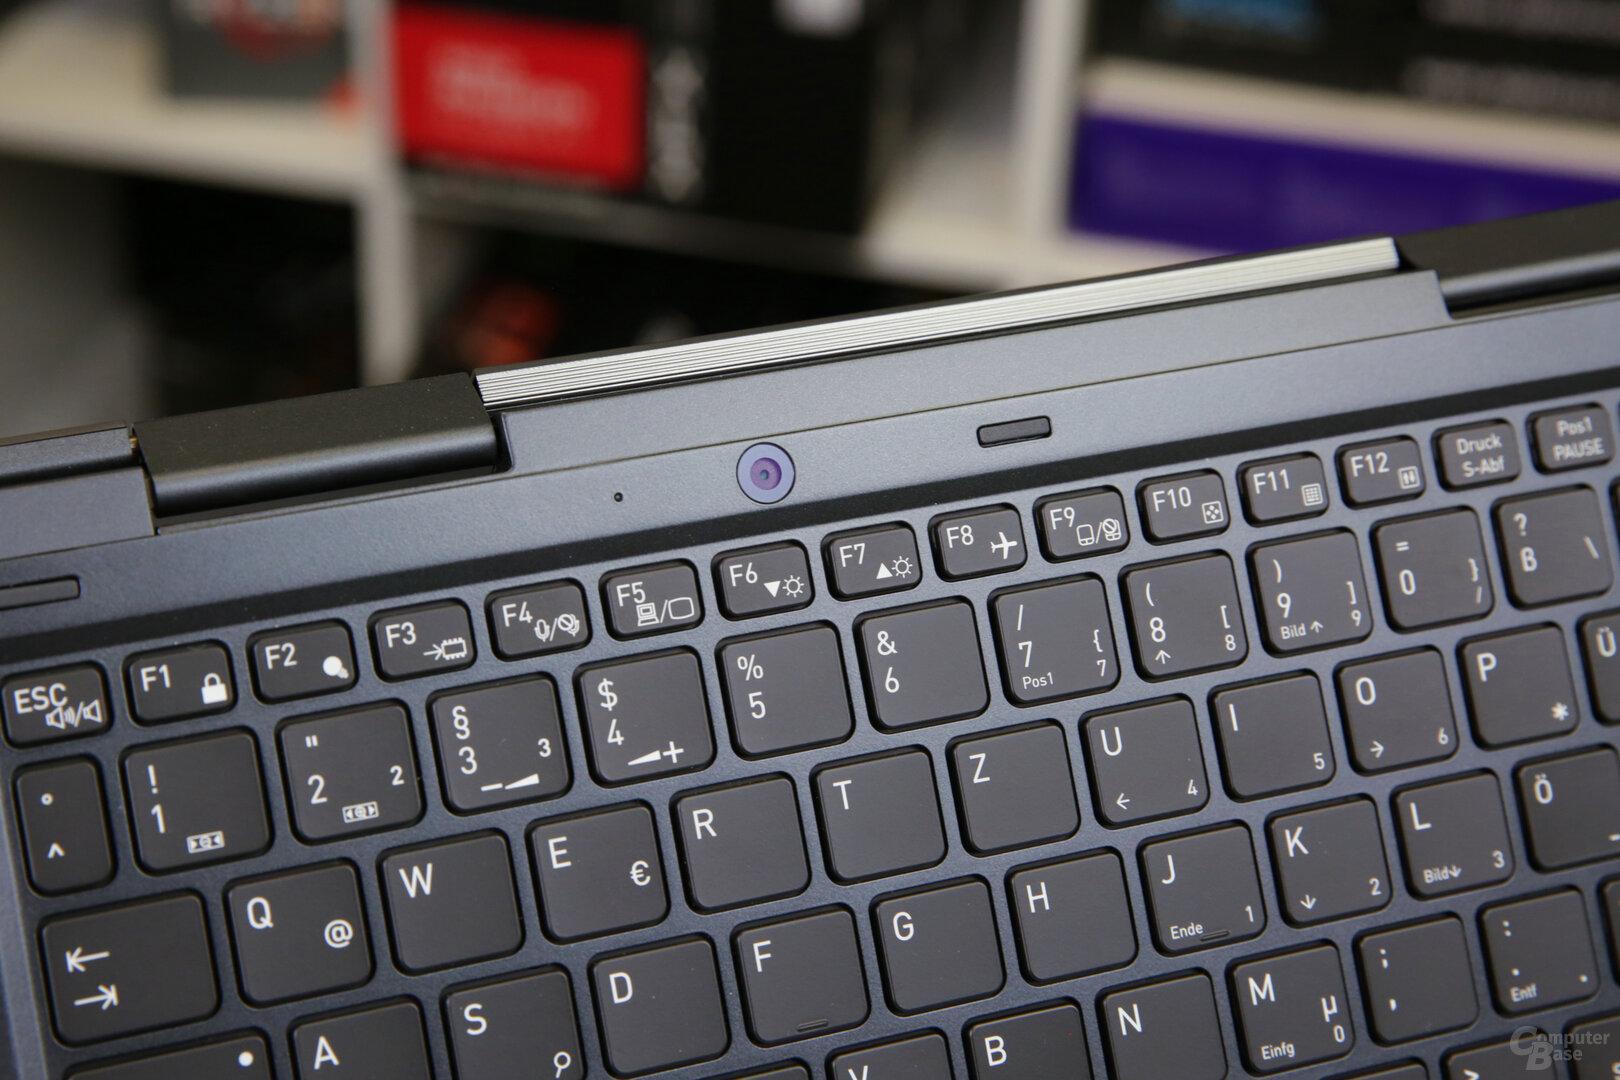 Rückseitige Kamera im Tablet-Modus